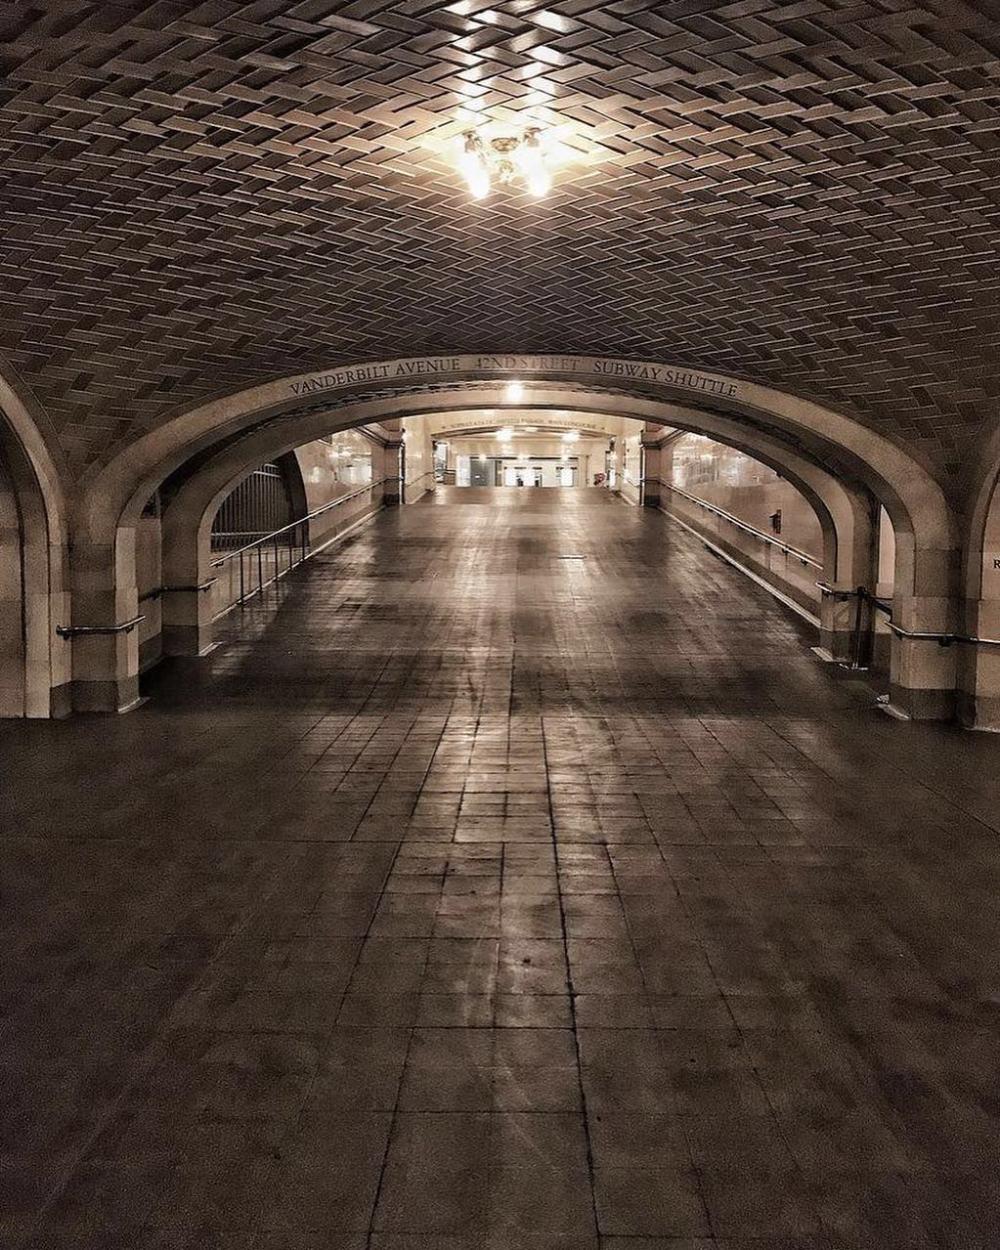 galerie des murmures grand central terminal.jpg